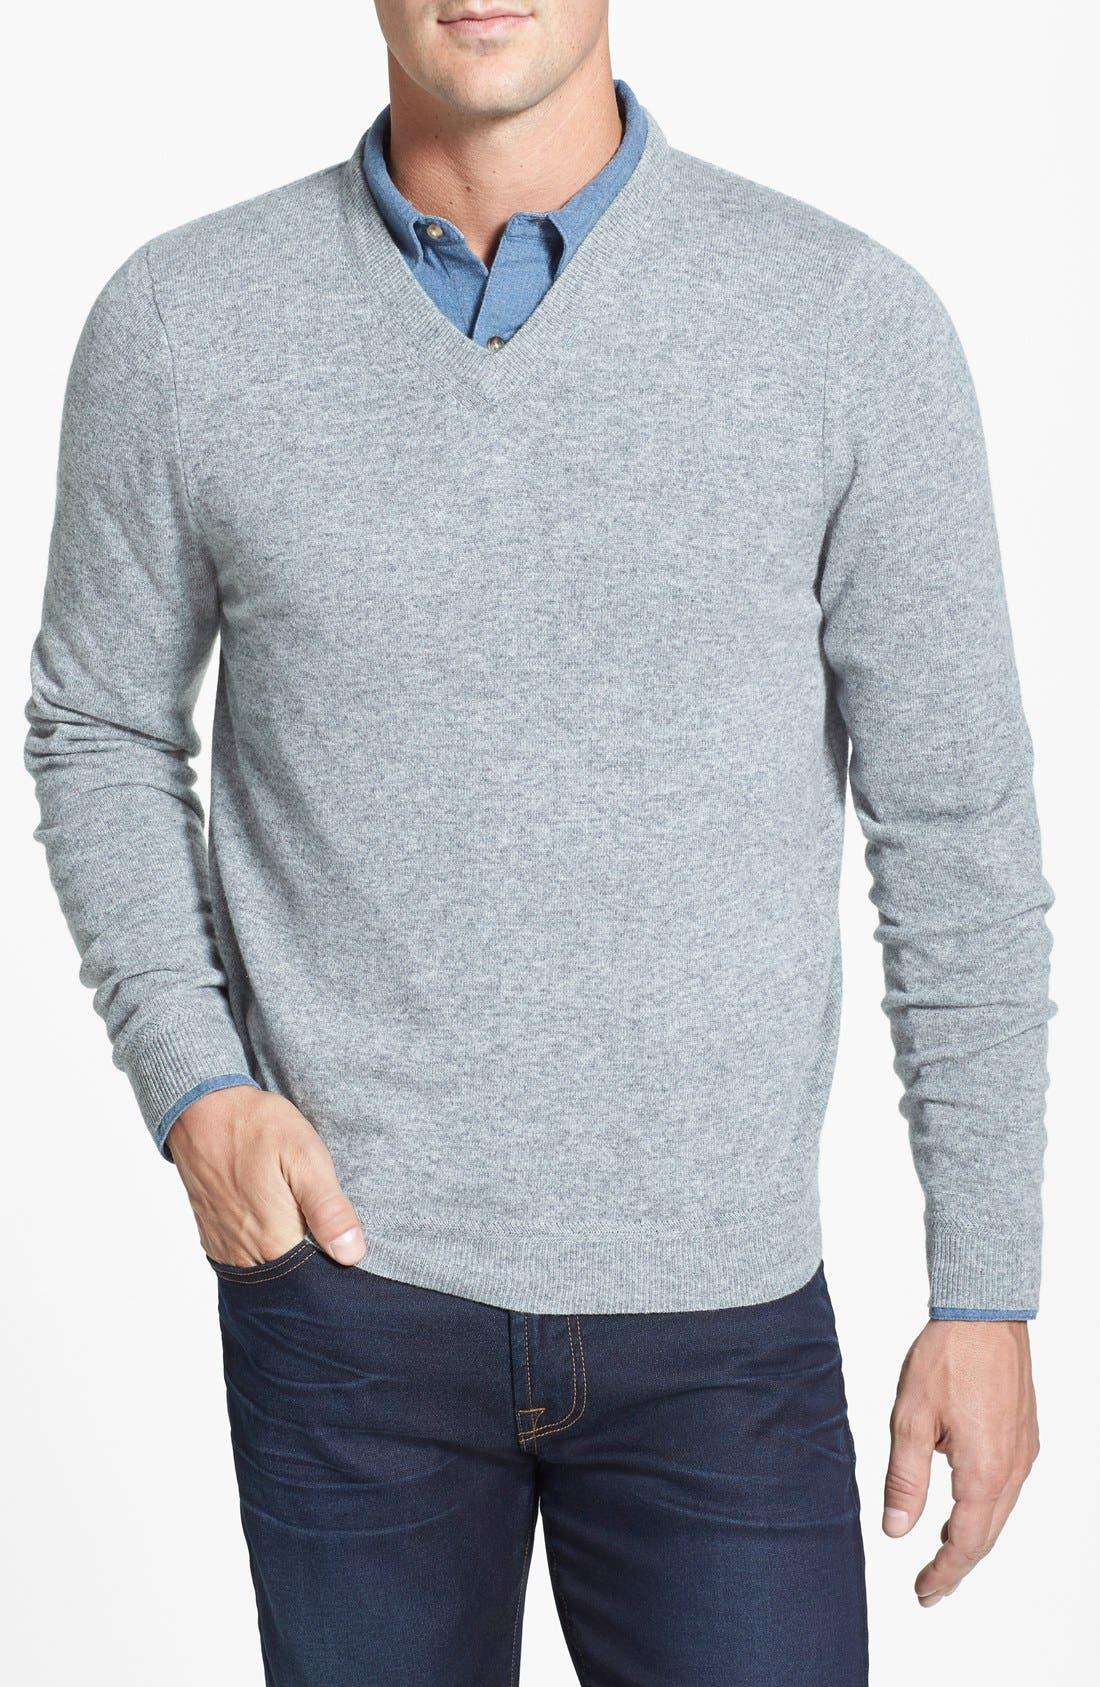 Main Image - John W. Nordstrom® V-Neck Cashmere Sweater